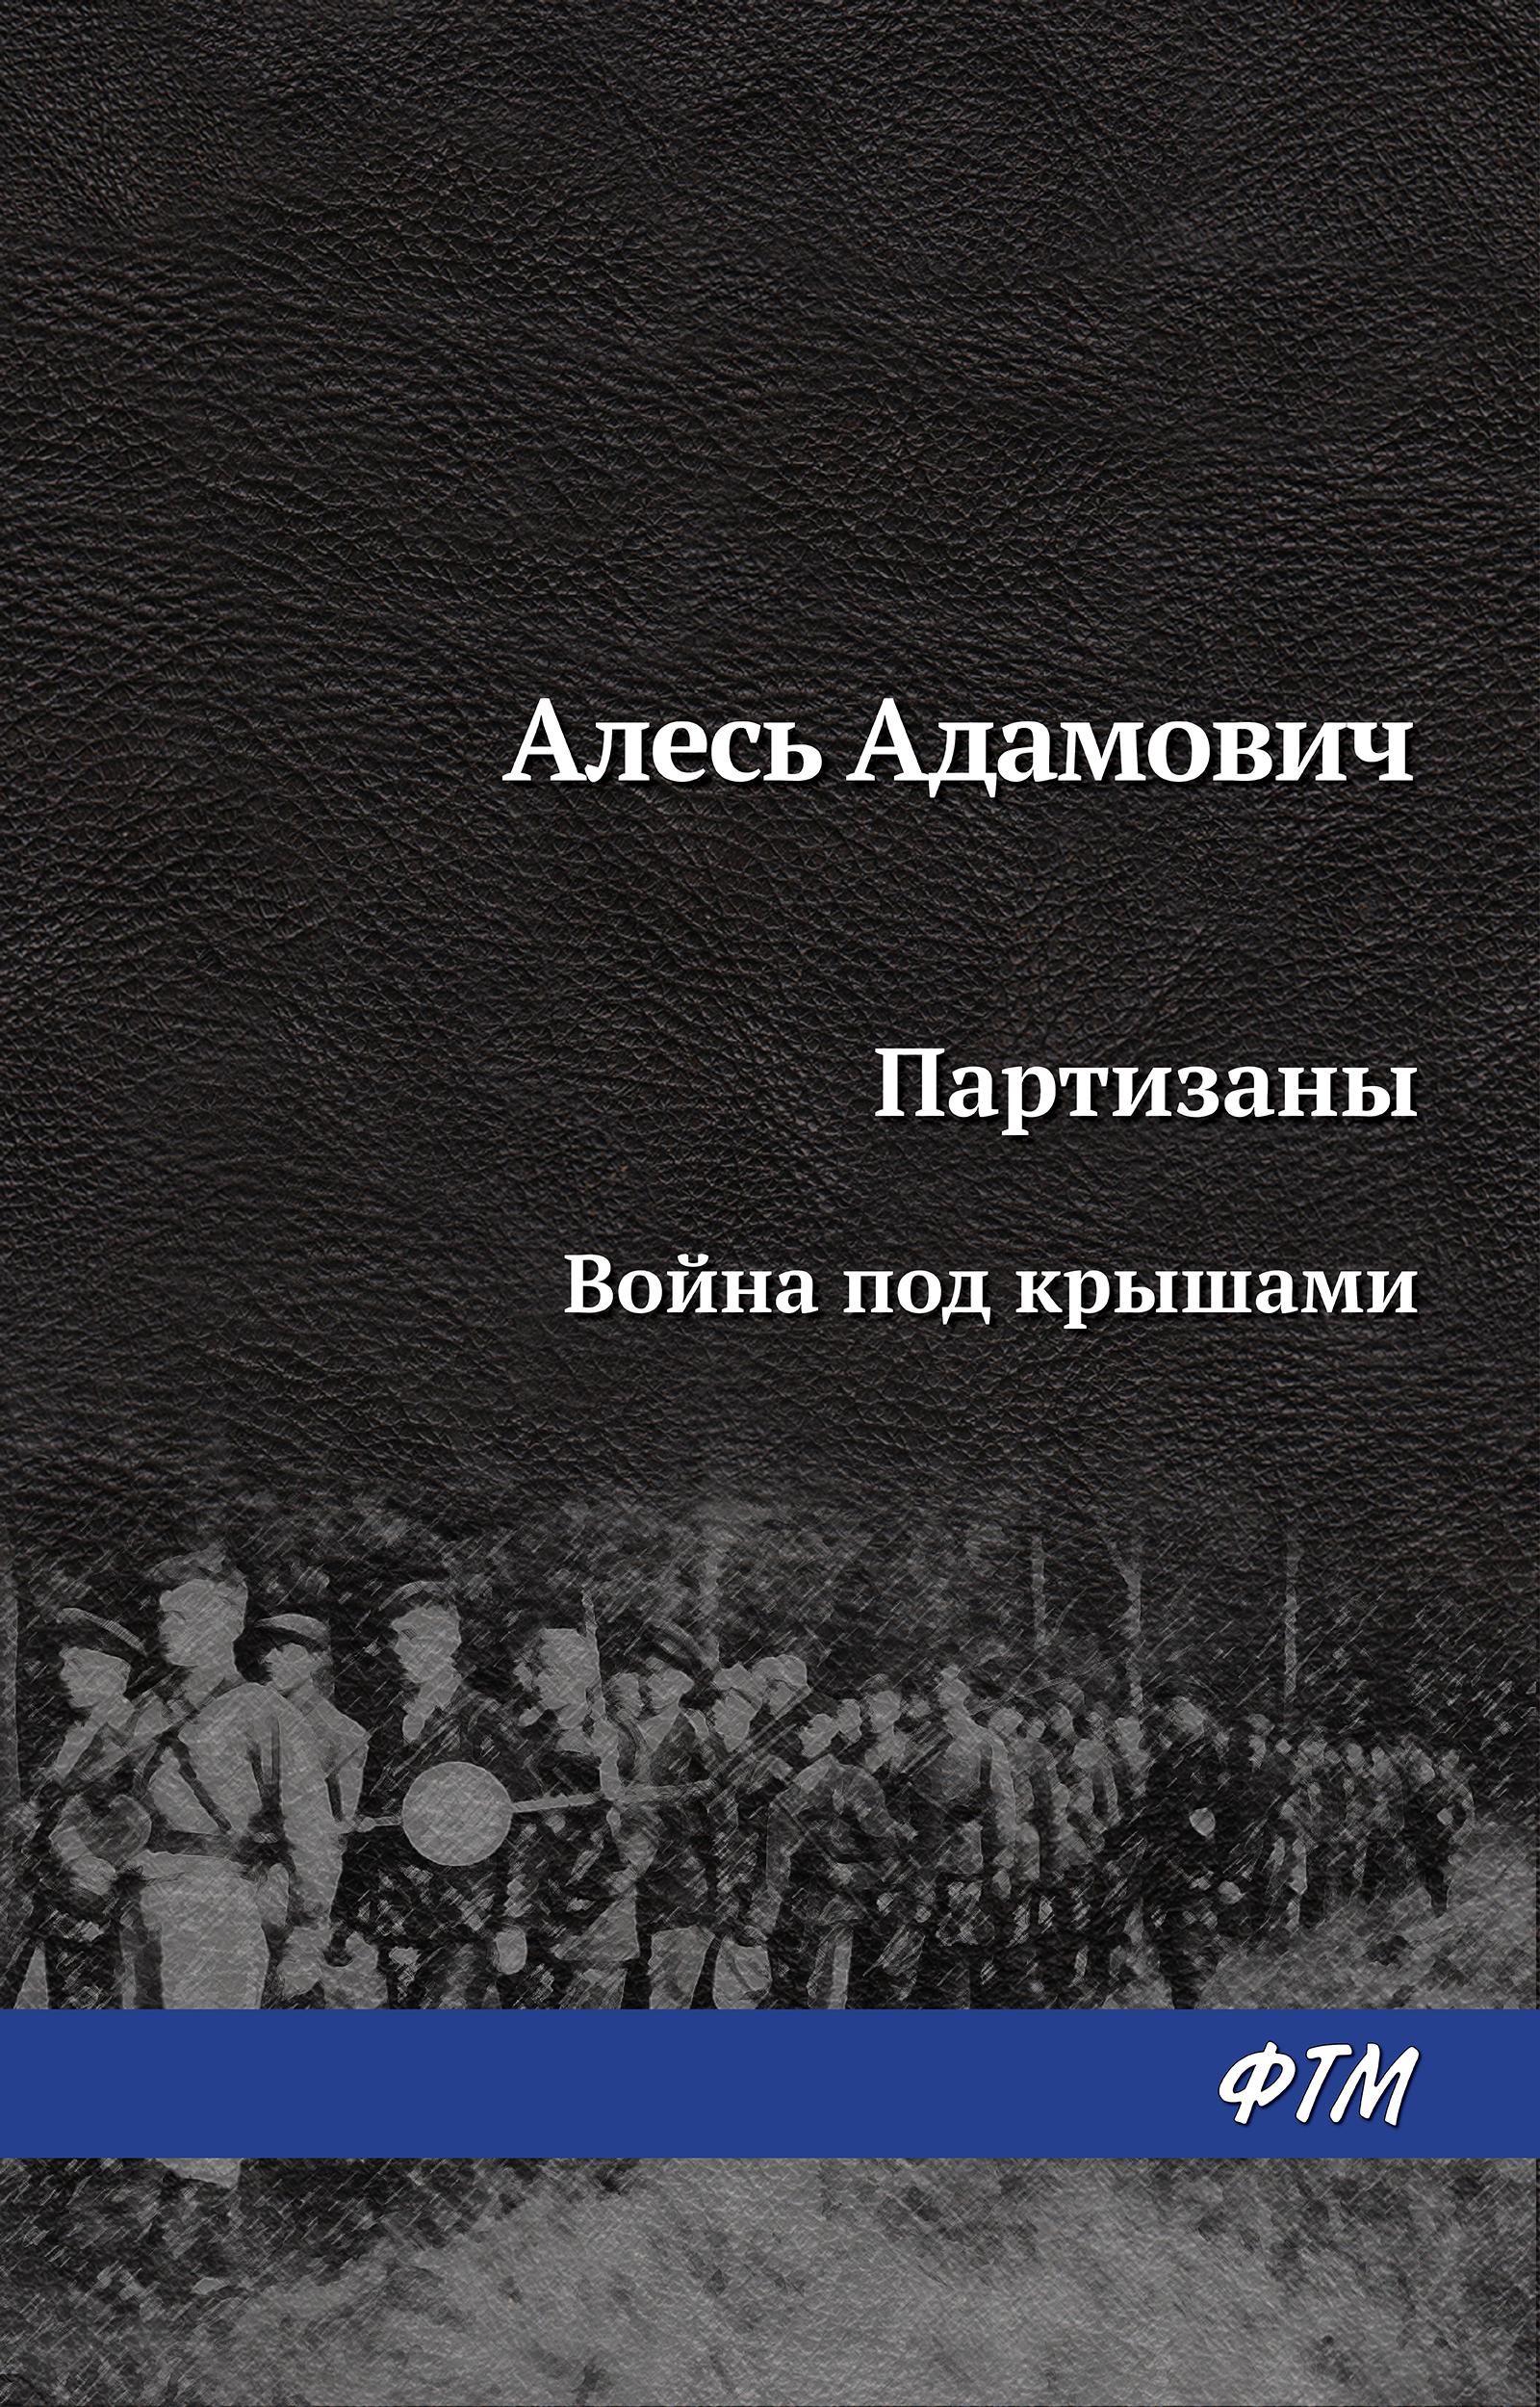 Алесь Адамович Война под крышами алесь адамович война под крышами